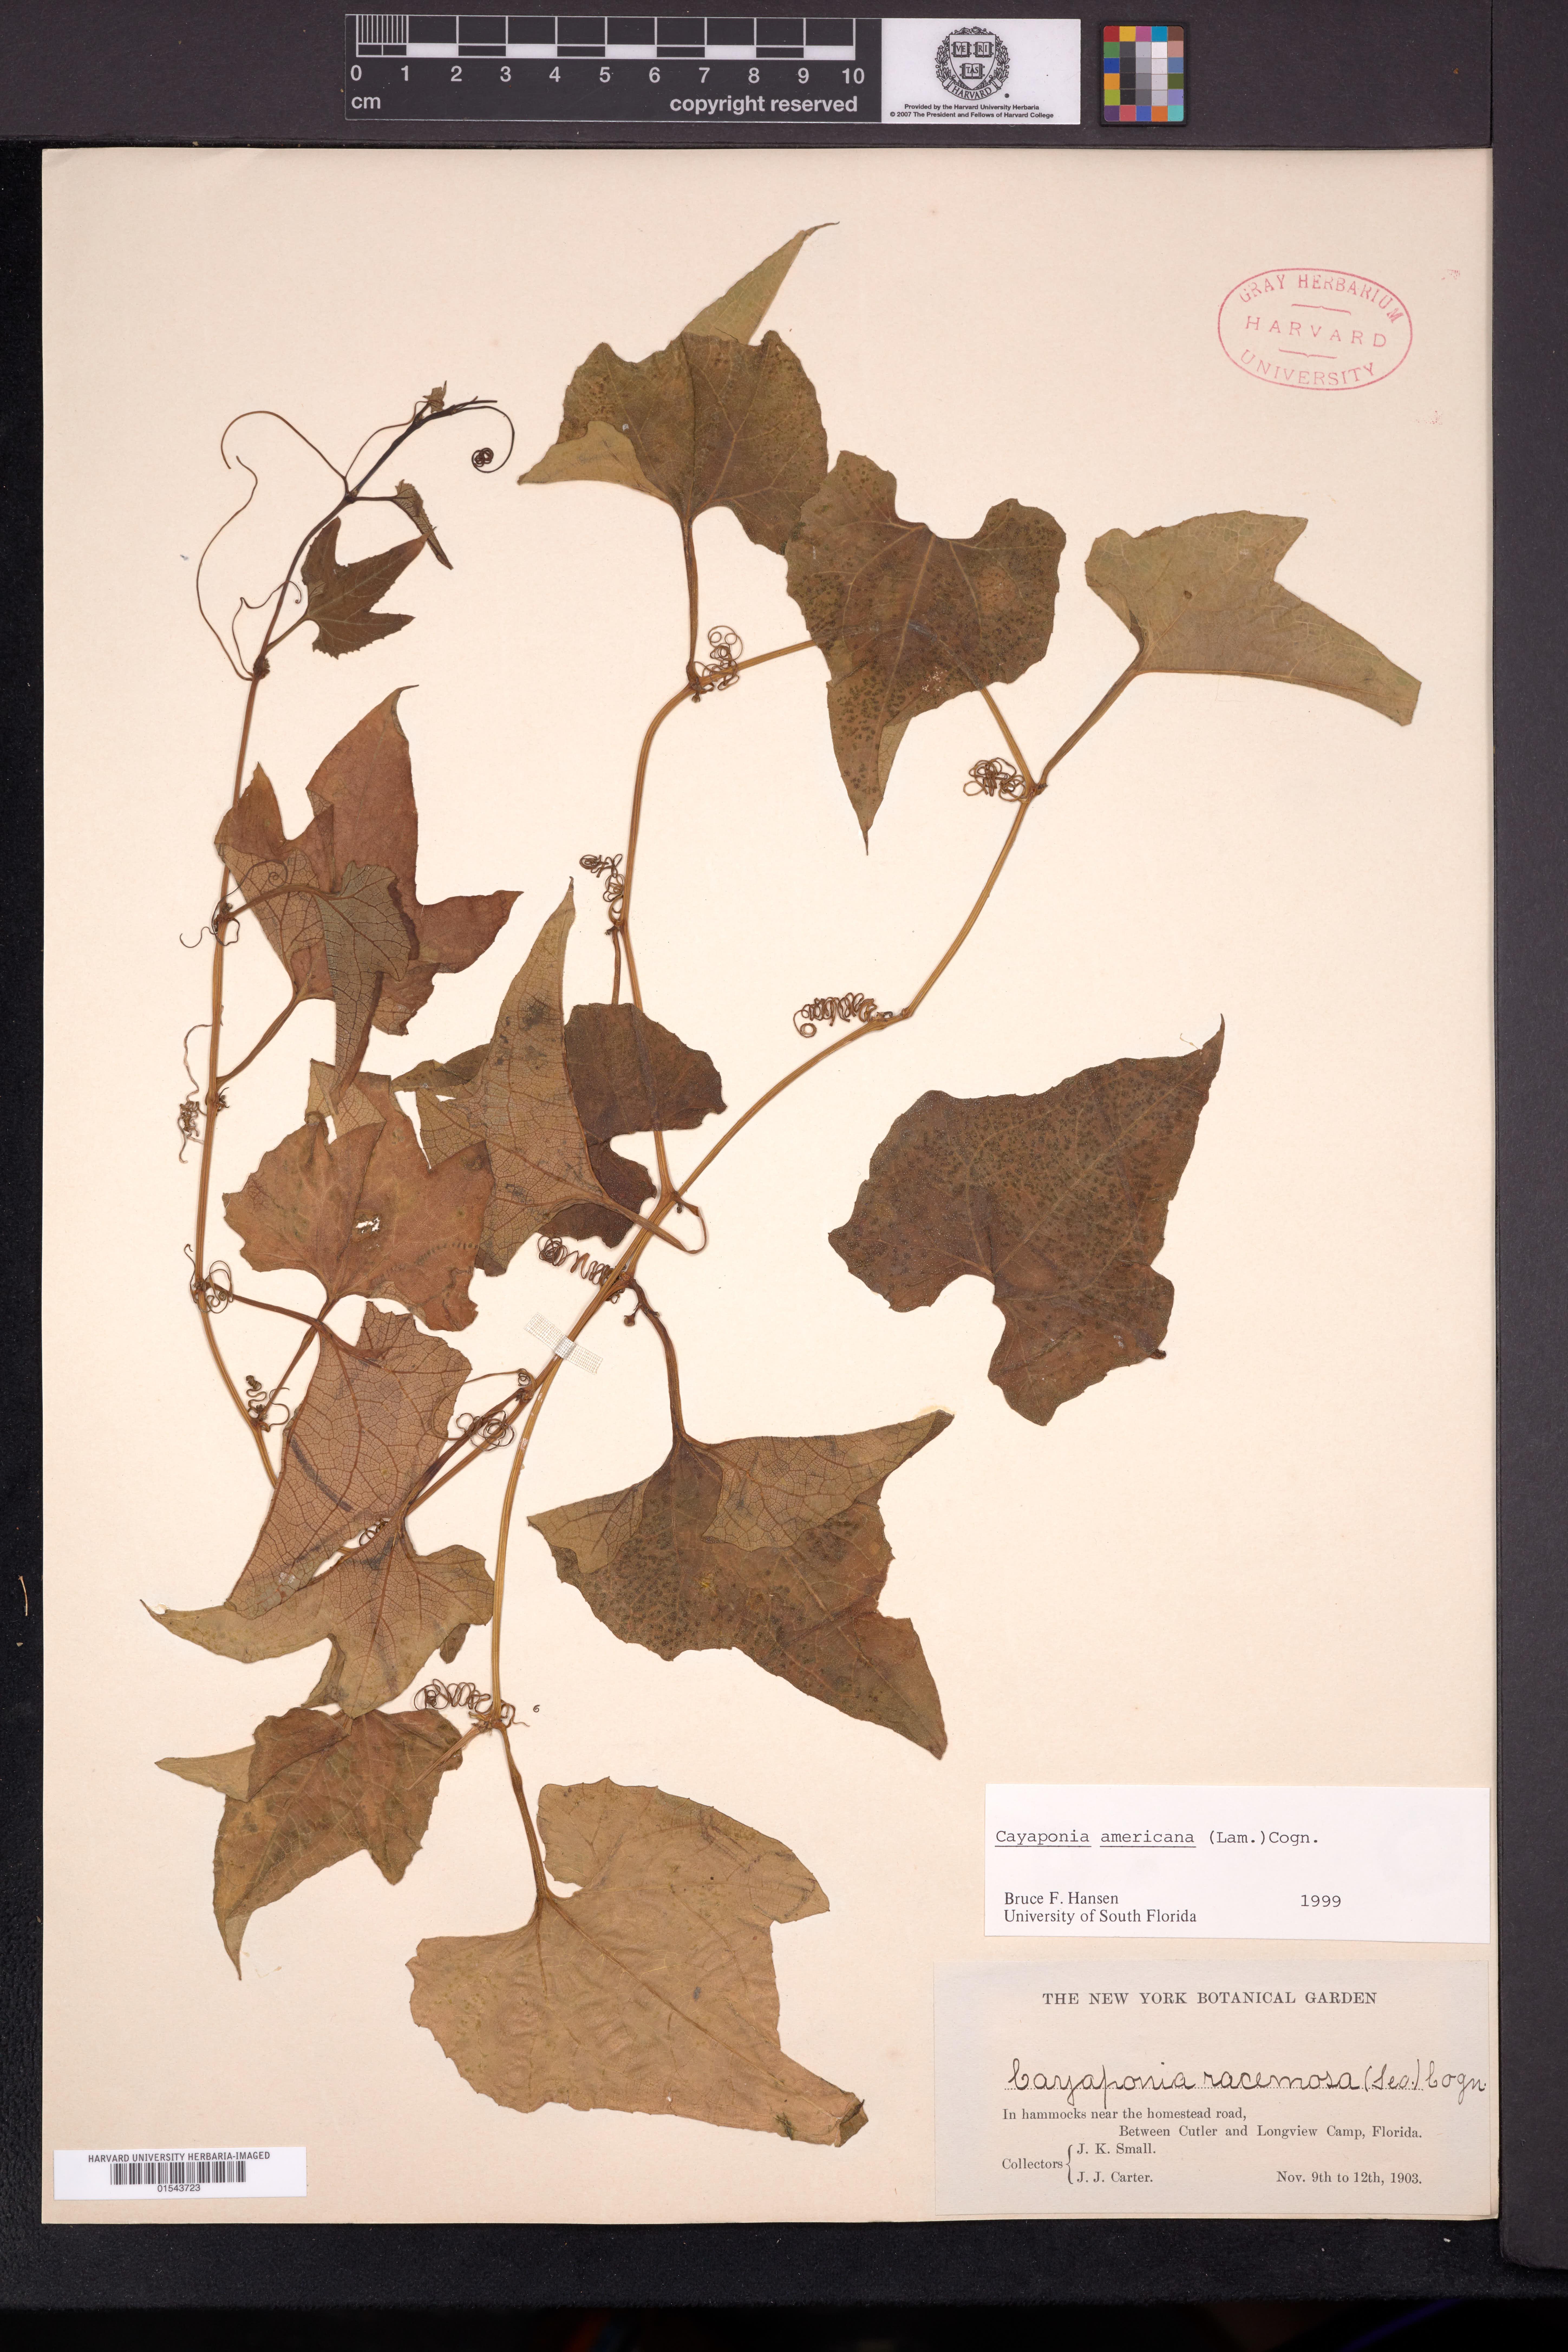 Image of Cayaponia americana